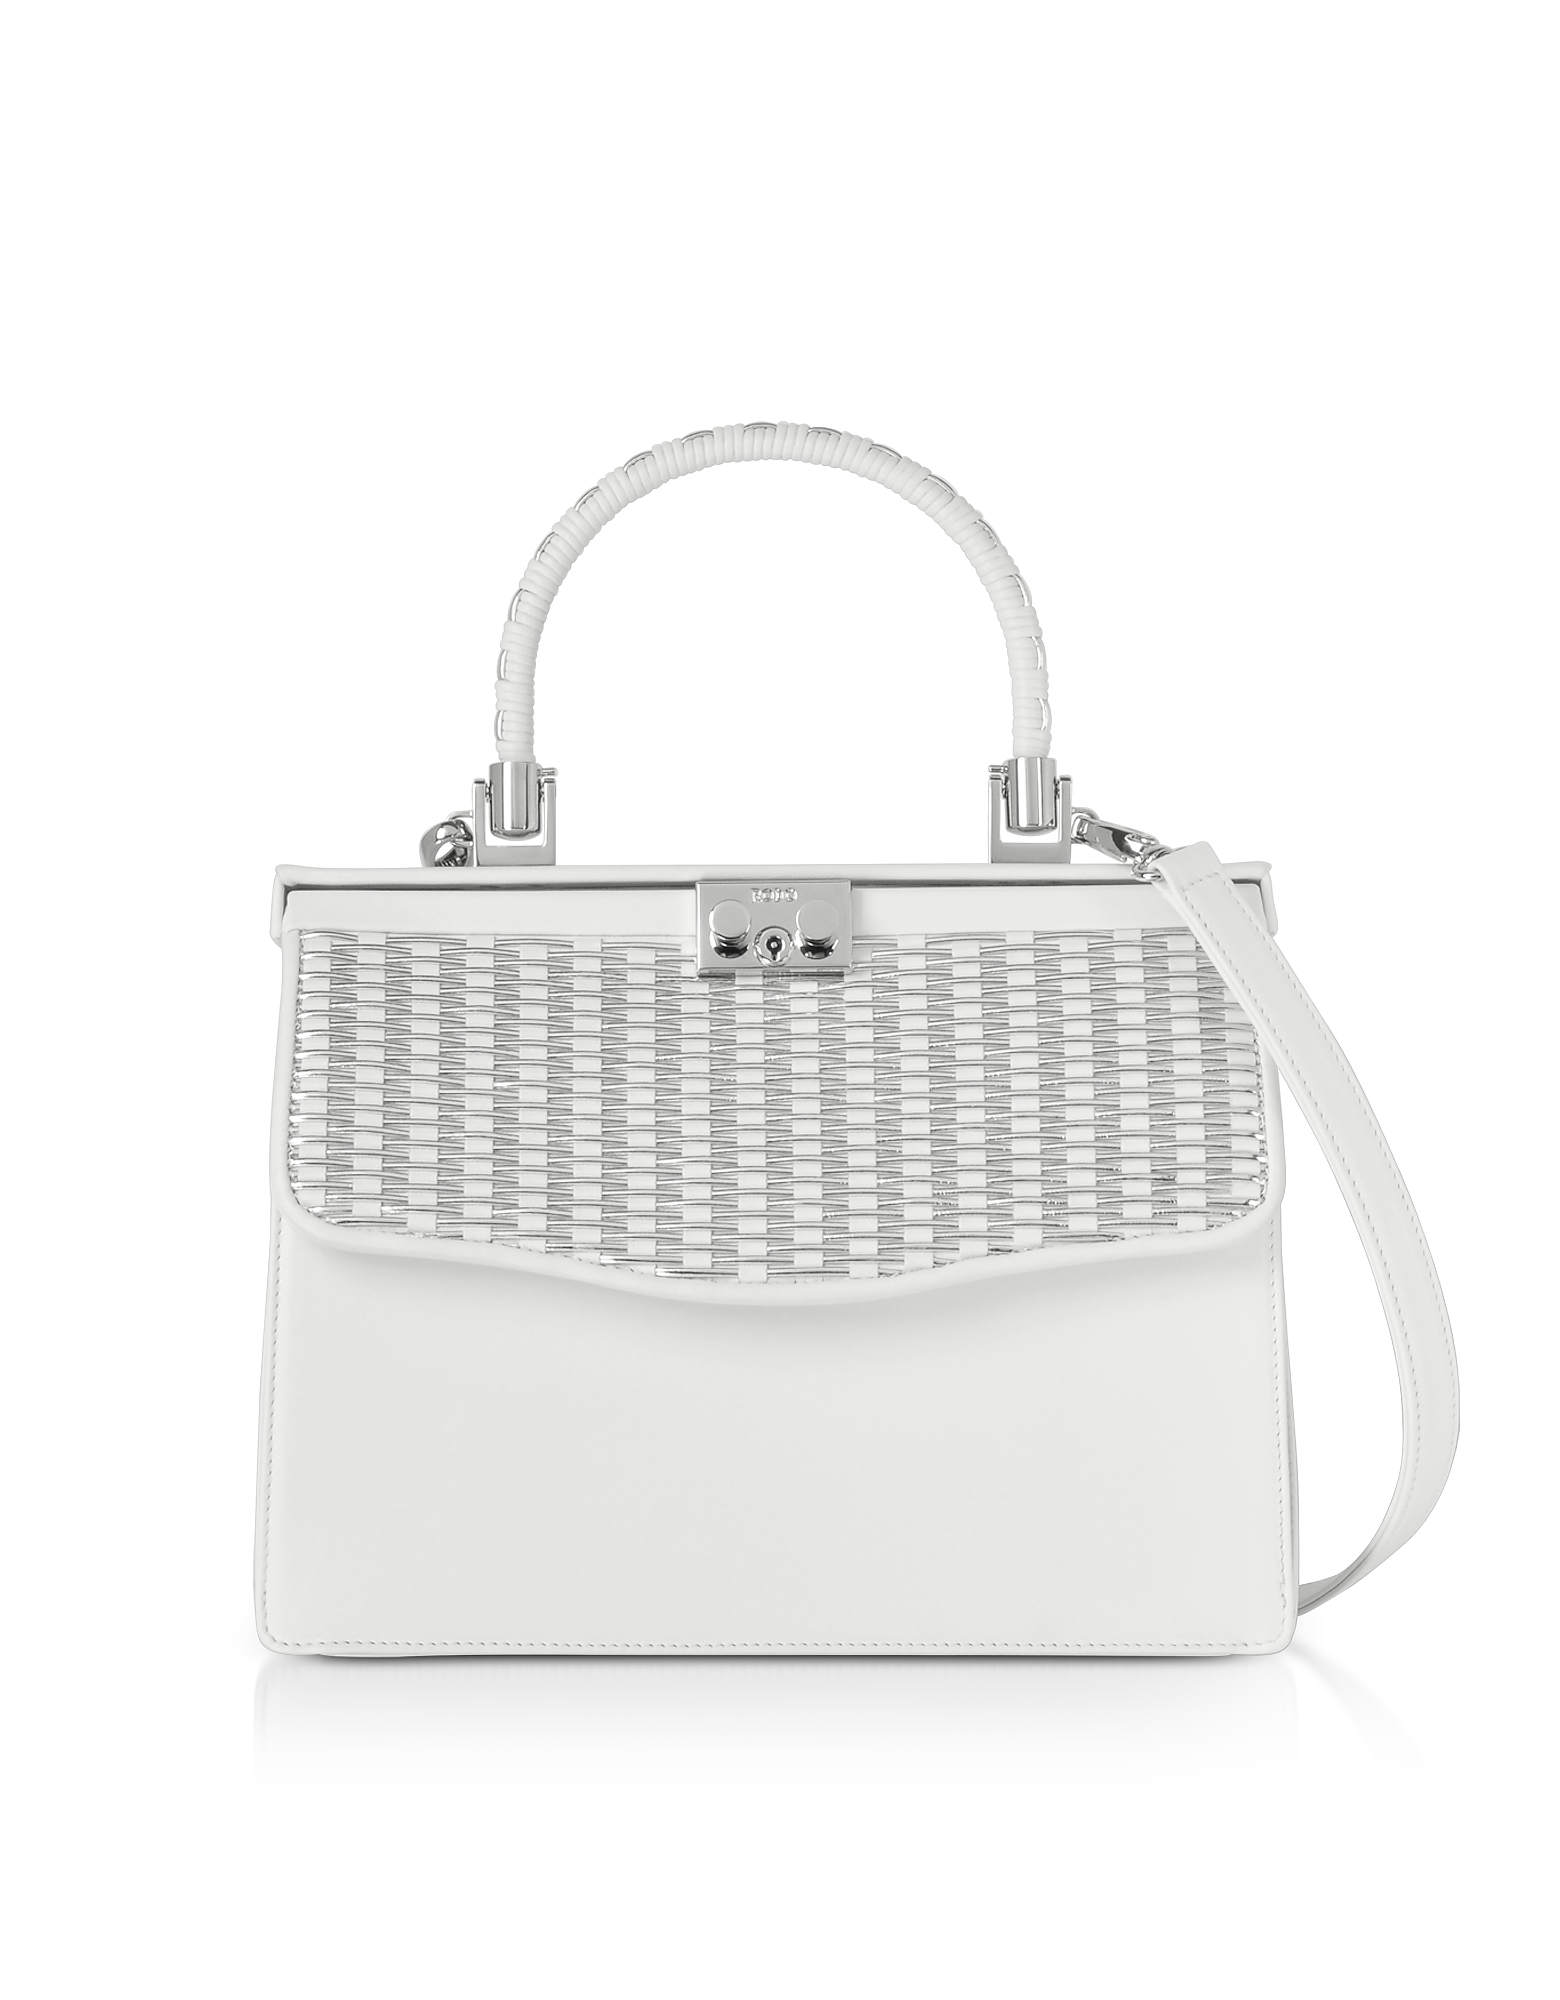 White Nappa Leather Top Handle Satchel Bag